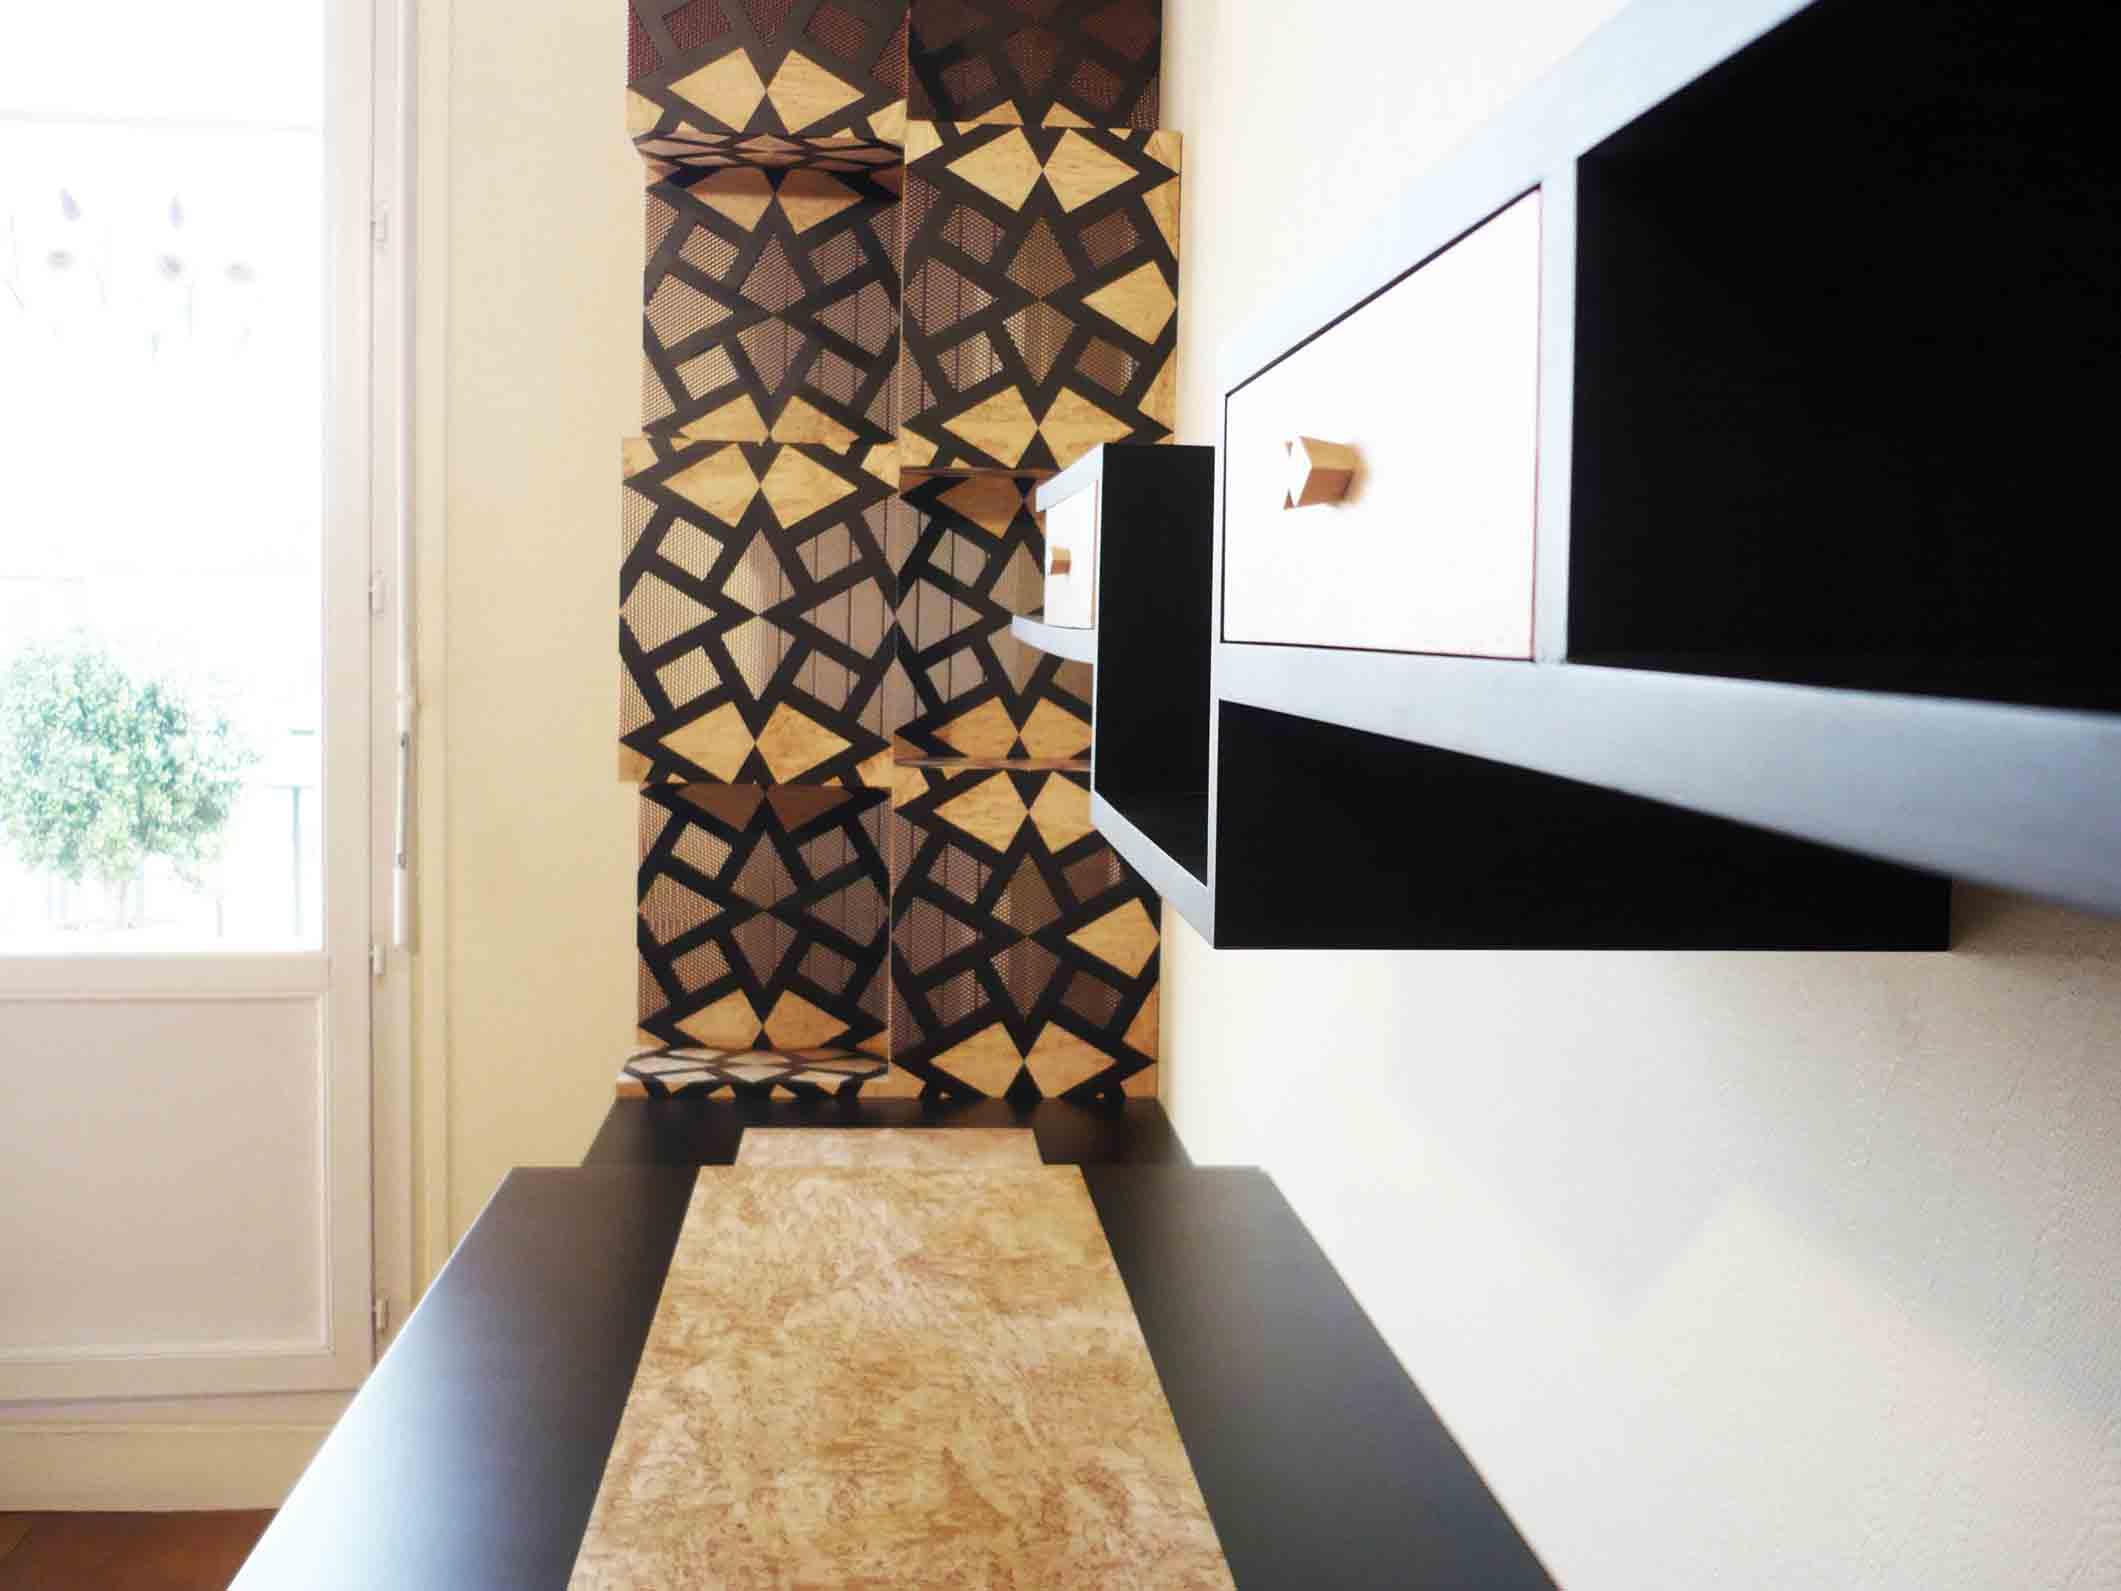 cache radiateur portfolio tag atelier helbecque 94 ile de france paris atelier helbecque. Black Bedroom Furniture Sets. Home Design Ideas